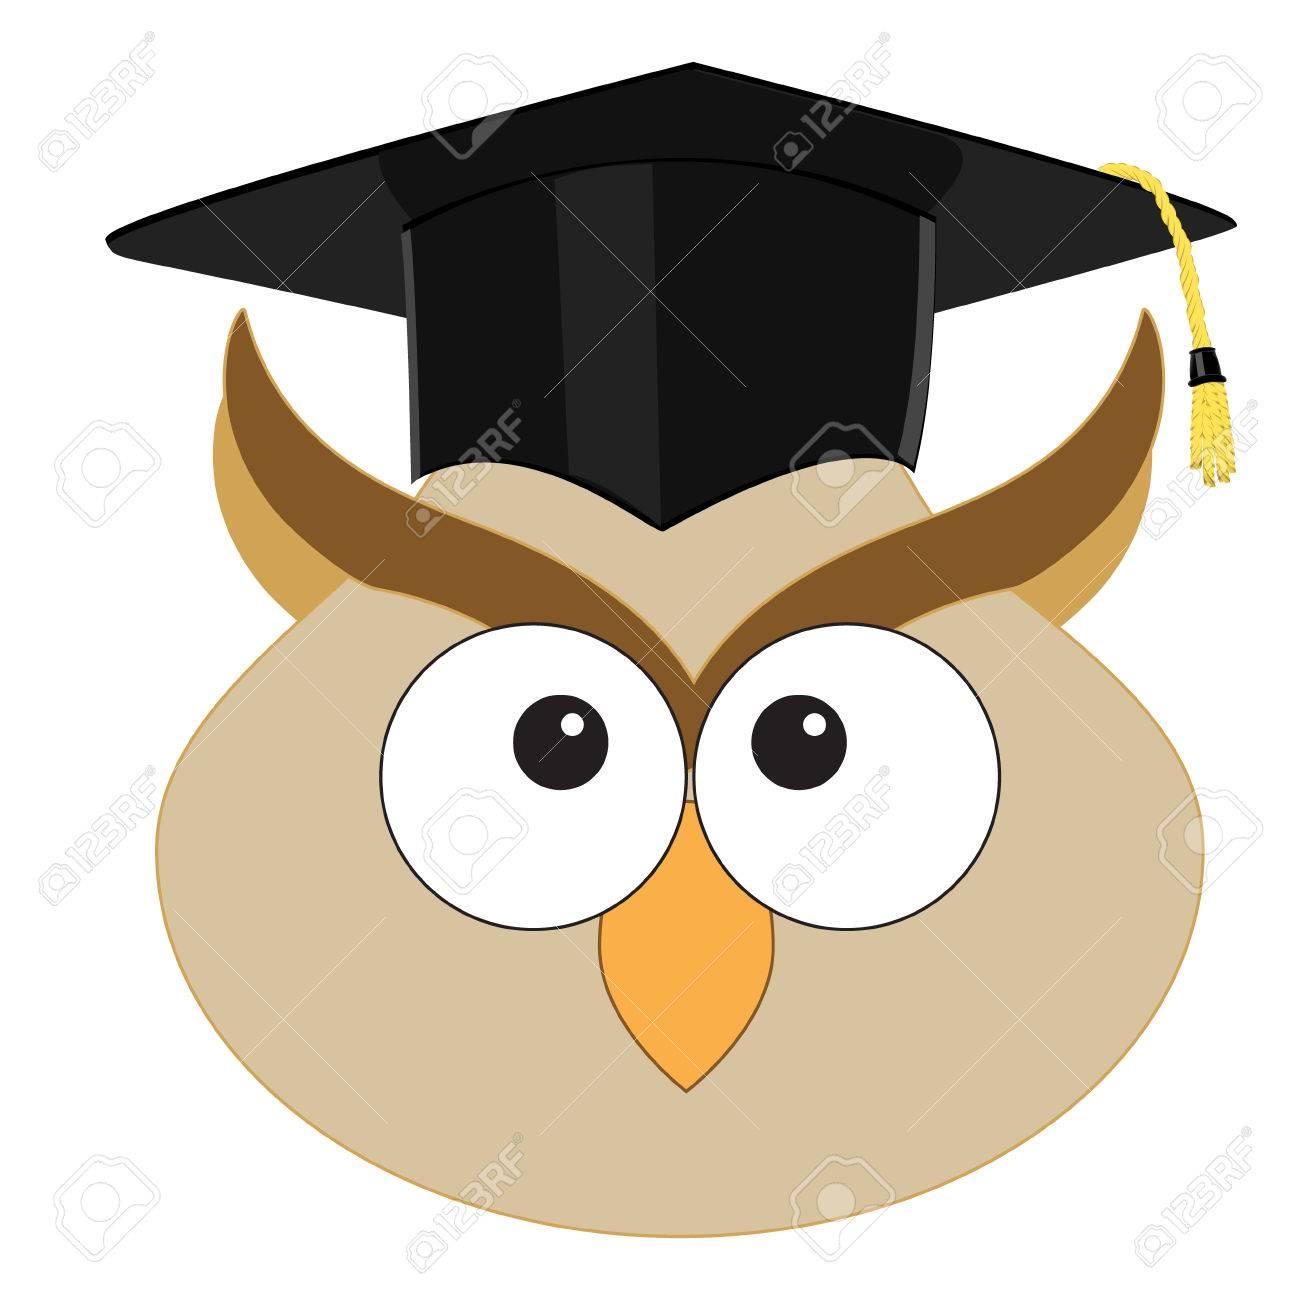 Vector Illustration Of Cartoon Wise Owl In Graduation Hat Symbol Of